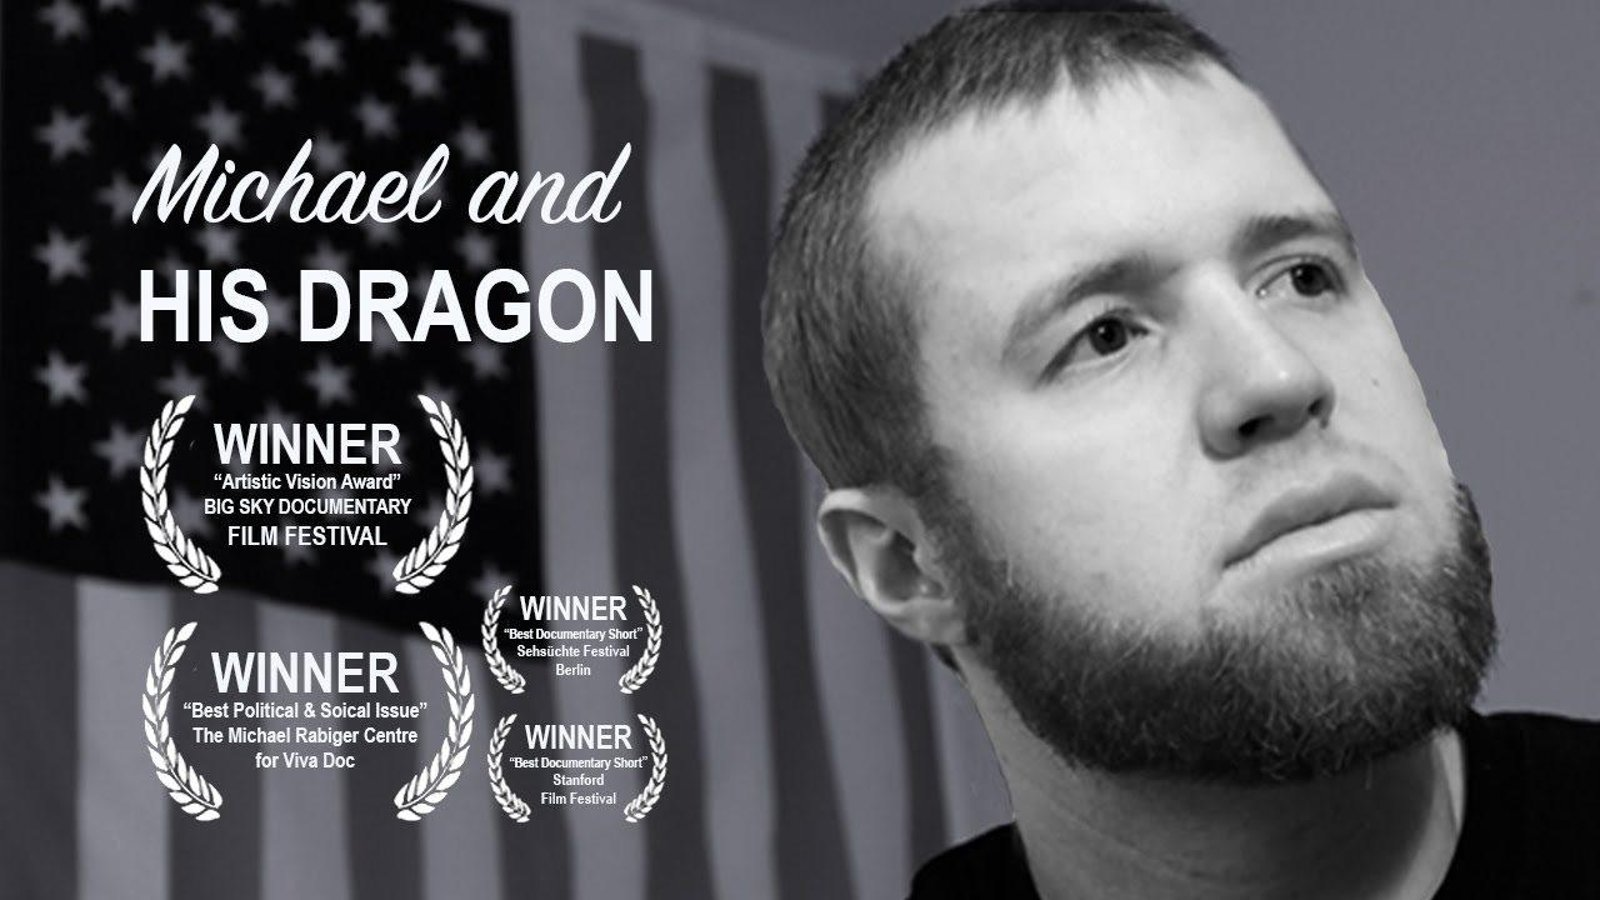 Michael & His Dragon - A U.S. Marine's Battle with PTSD